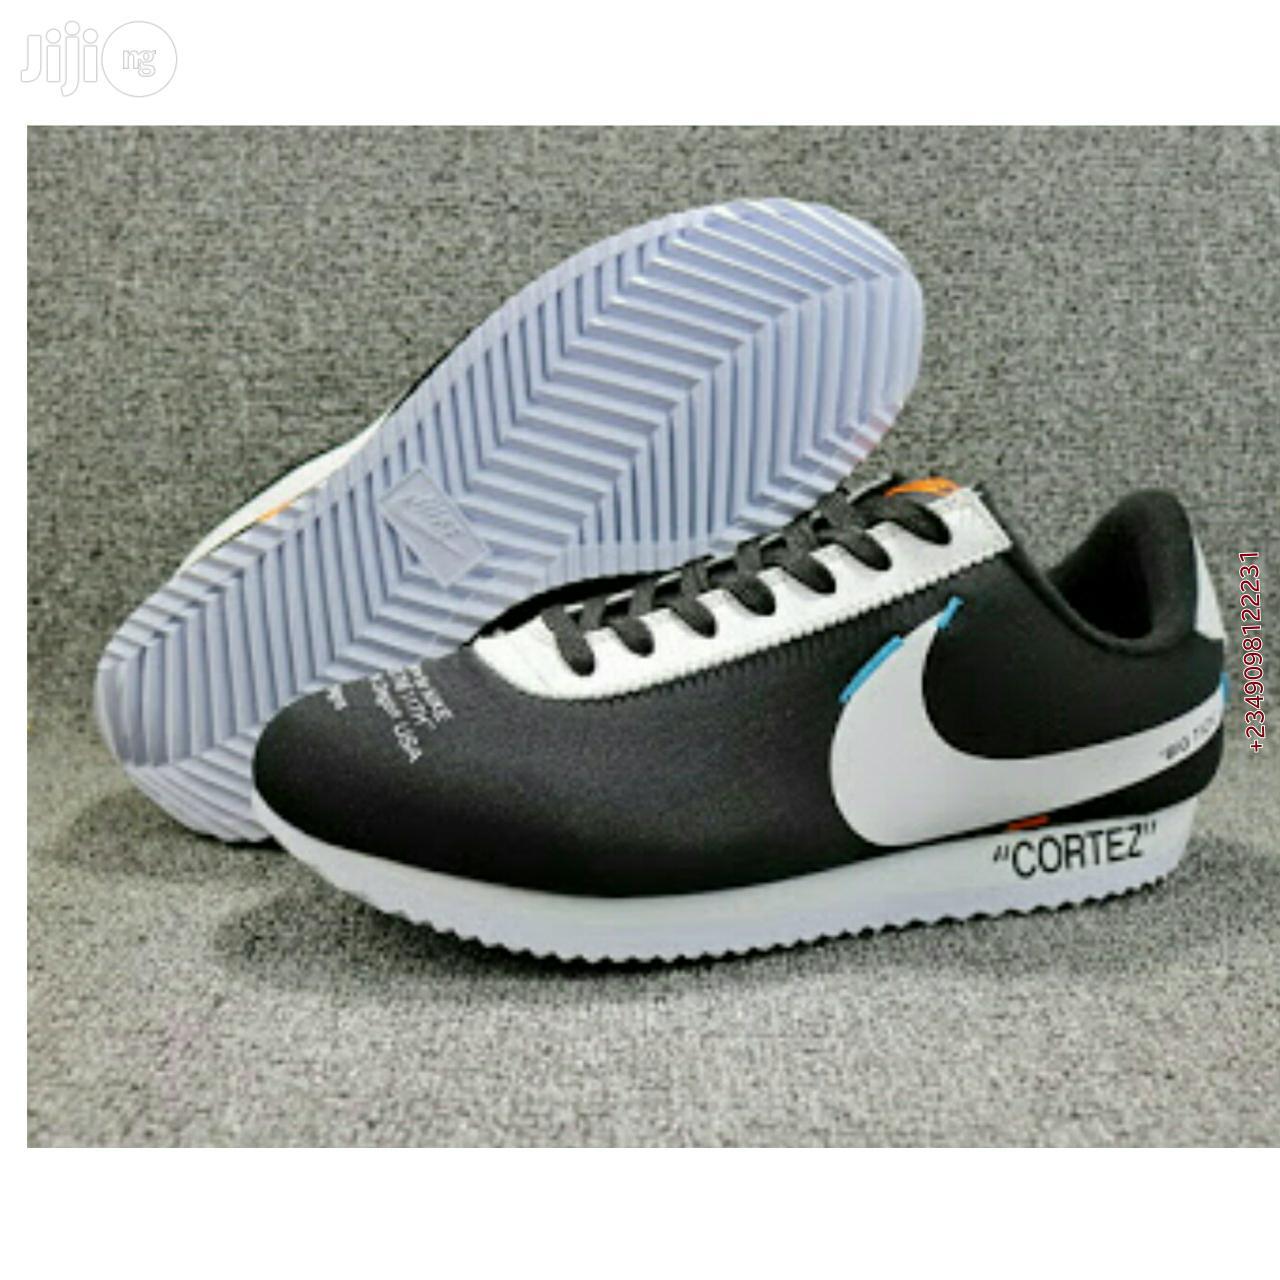 Off-White Nike Cortez Ultra White And